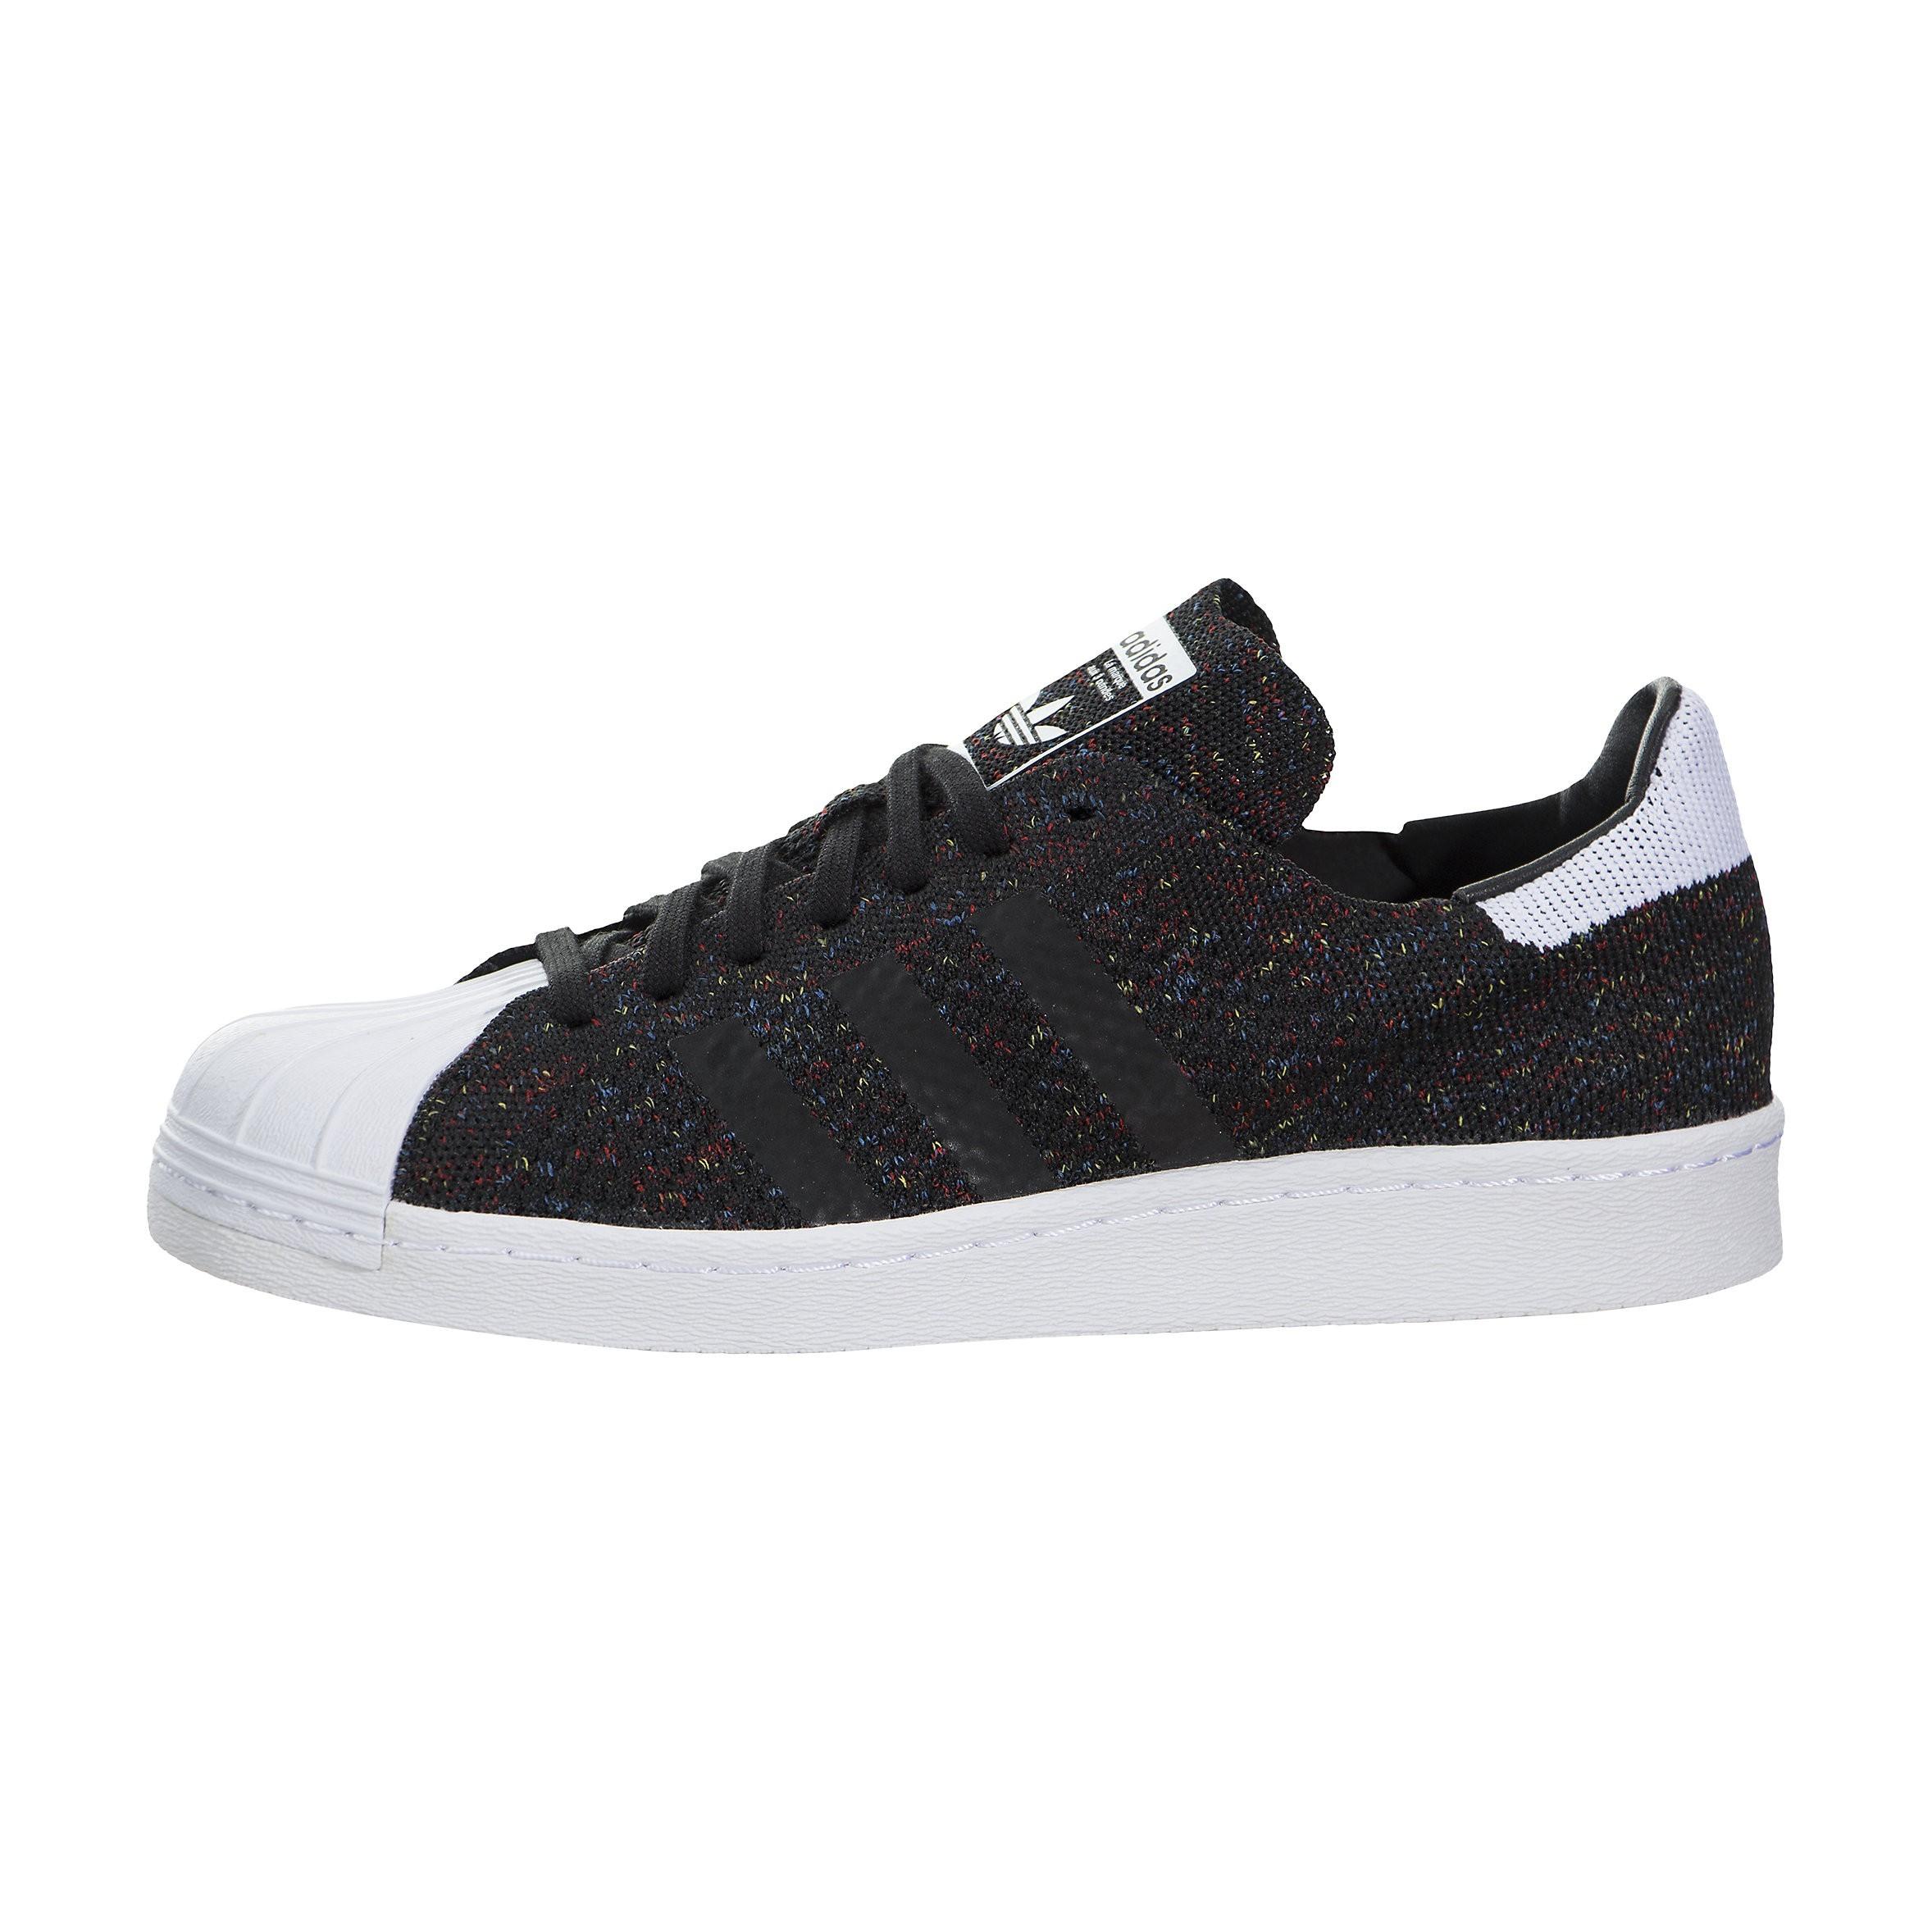 Hombre adidas Originals Neighbourhood Superstar 80s Zapatilla s75844